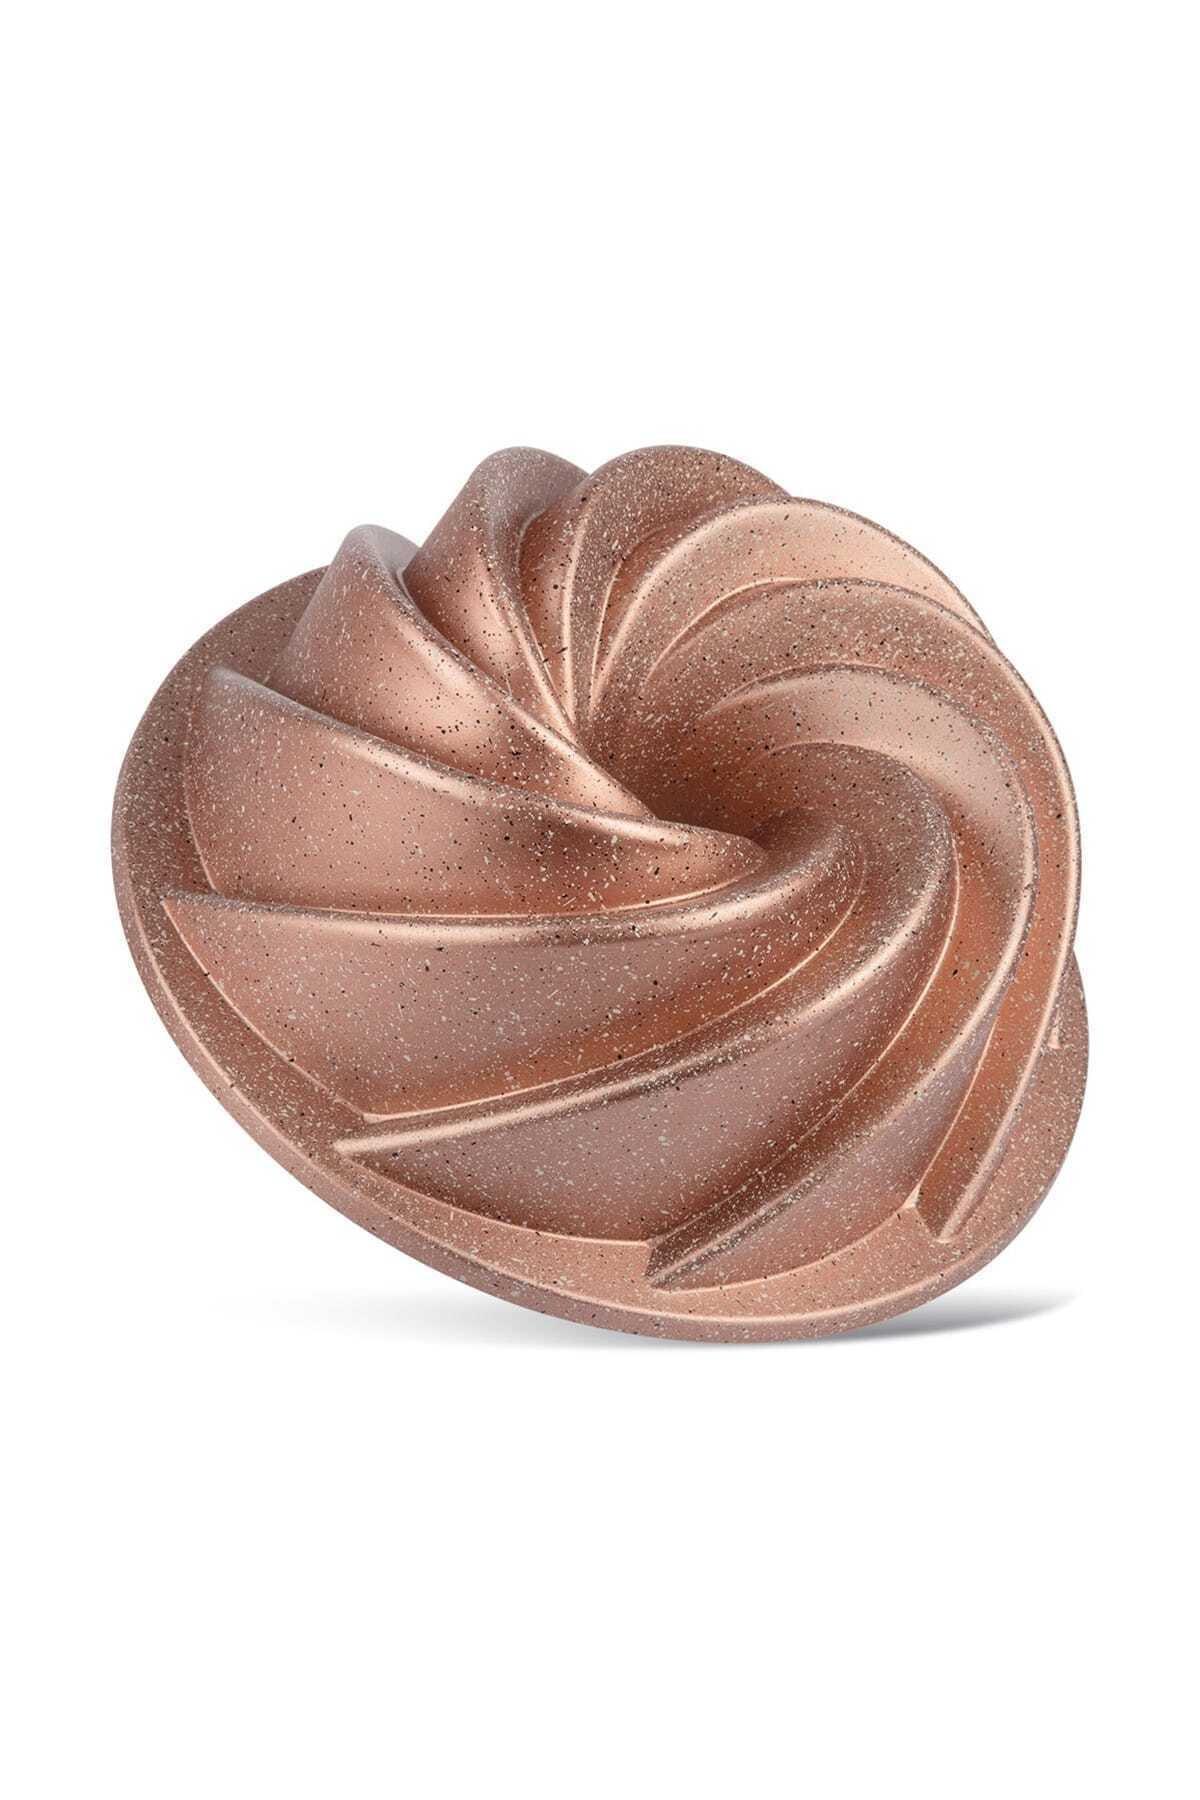 ThermoAD Granit Kek Kalıbı Rüzgar Gülü Rose Gold 1